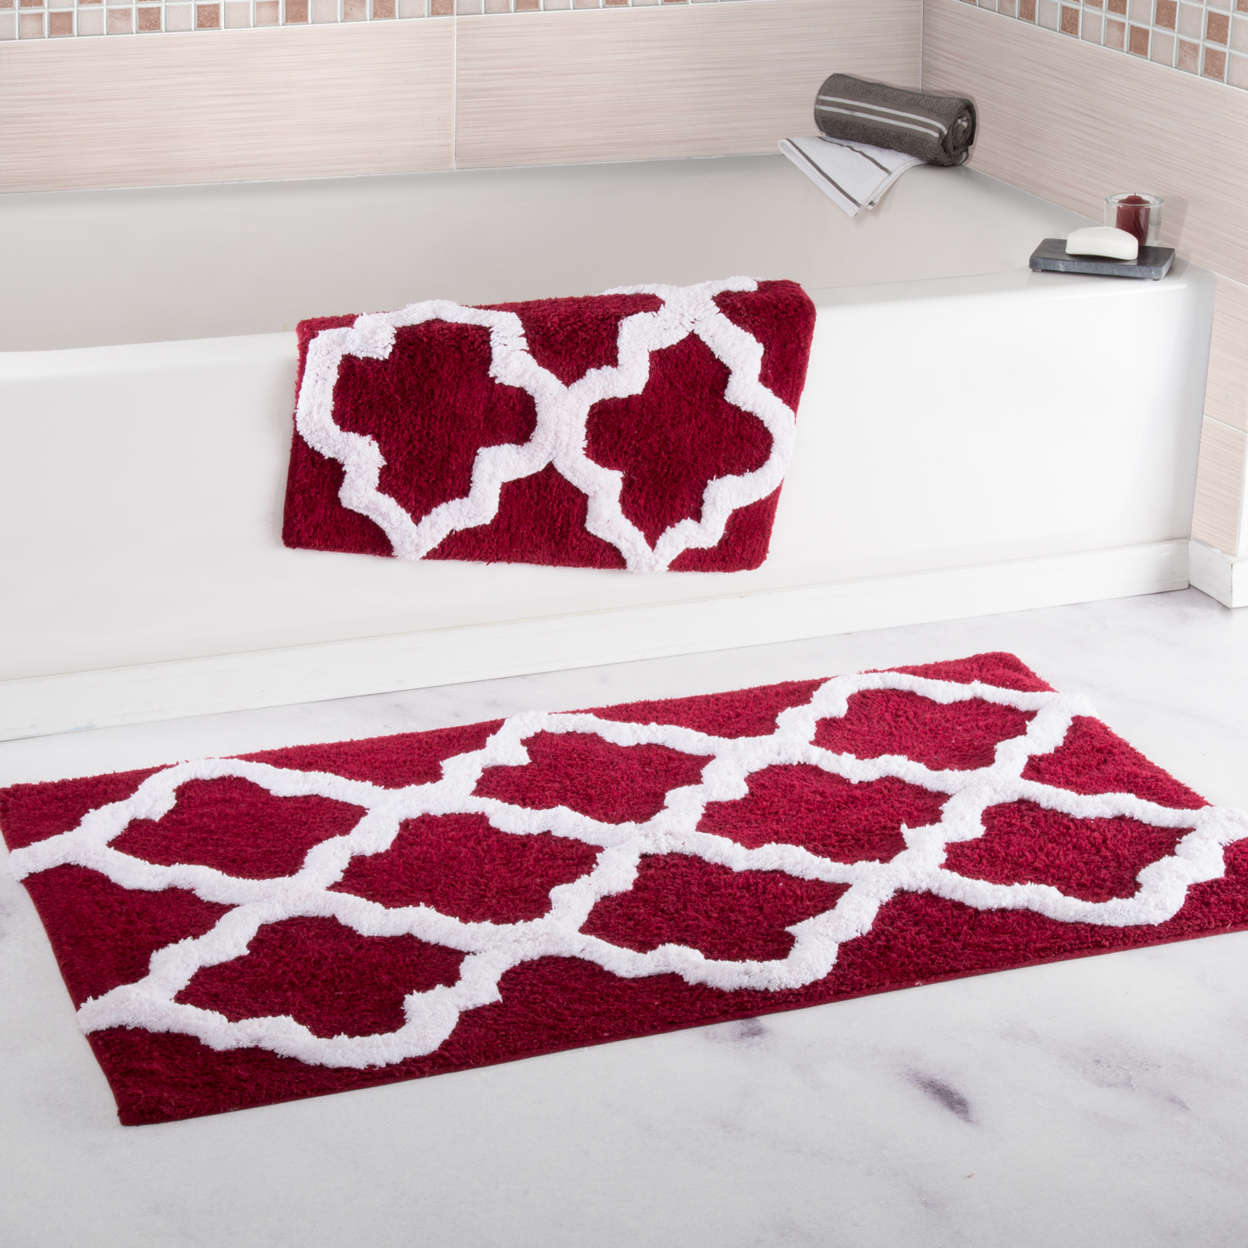 Lavish Home 100% Cotton 2 Piece Trellis Bathroom Mat Set - Burgundy (1)